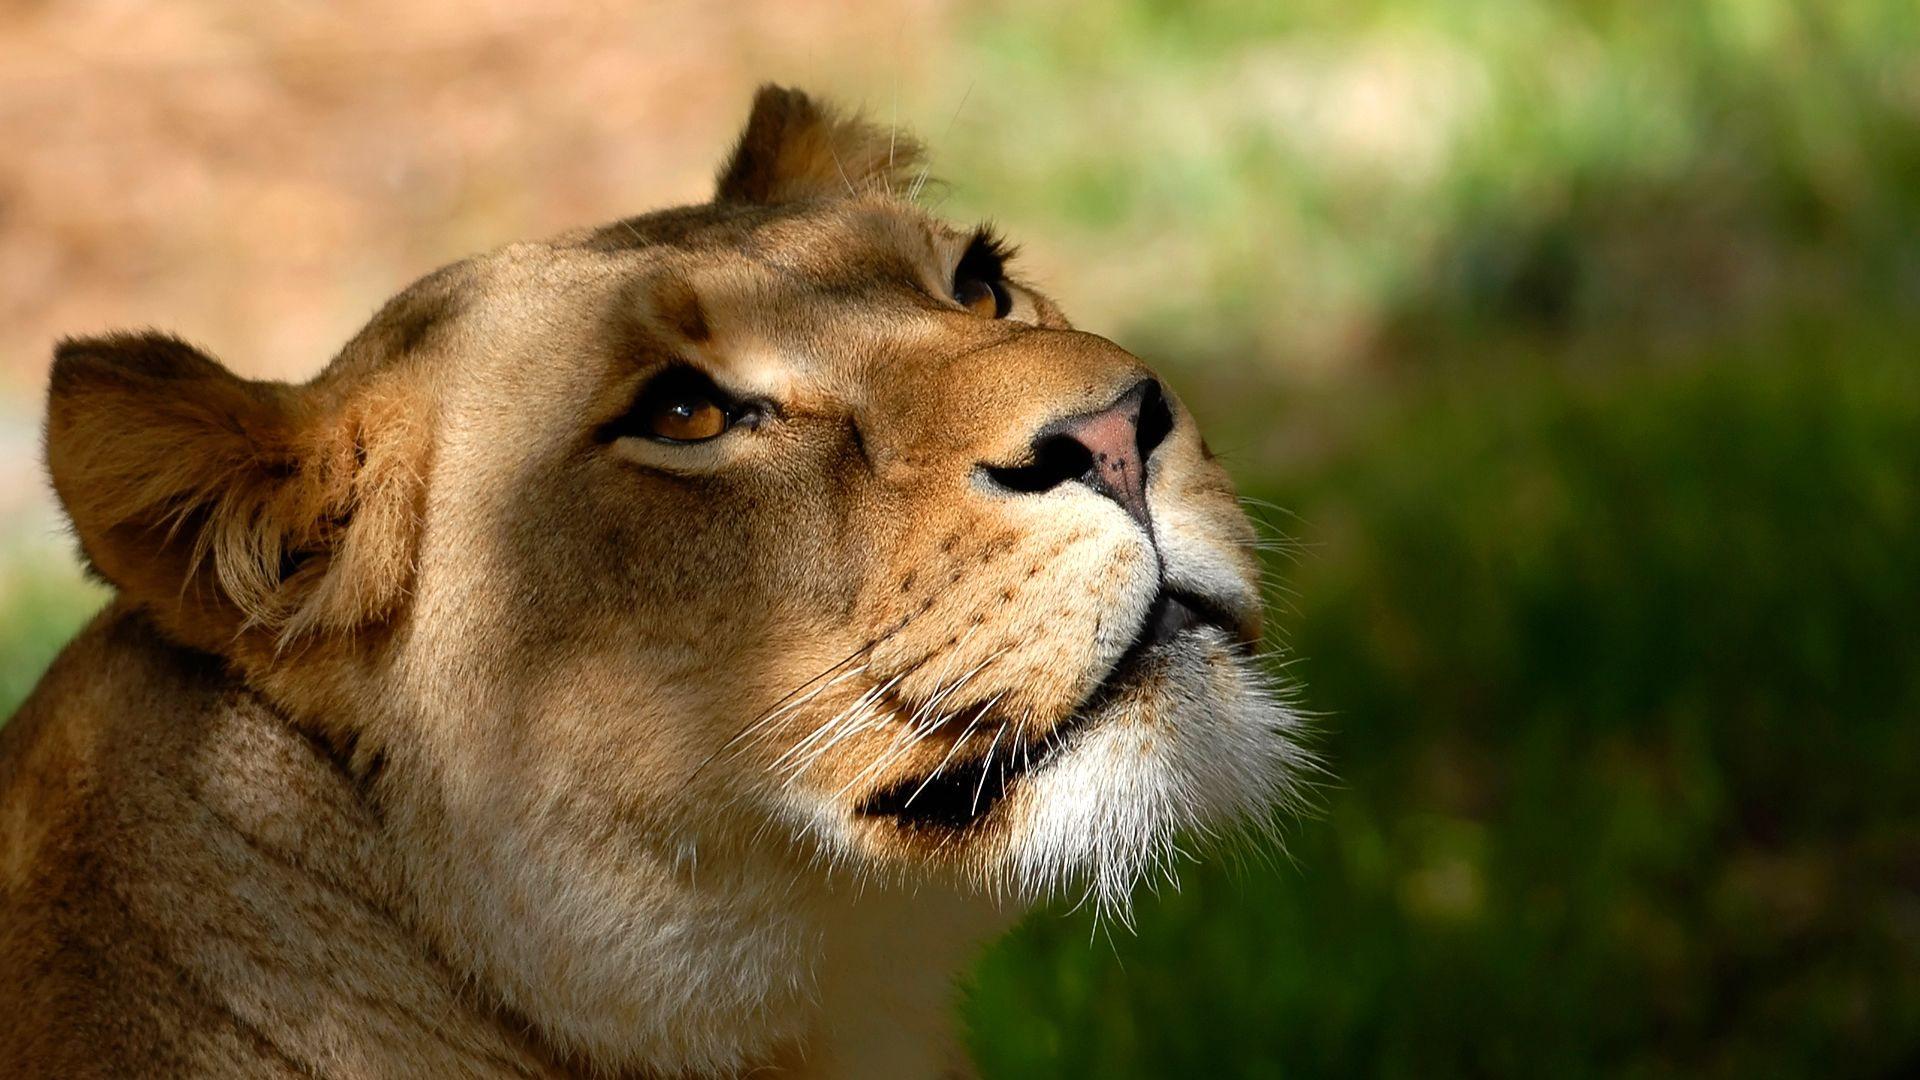 Lion full hd wallpaper face 19201080 1080p download Full HD 1920x1080